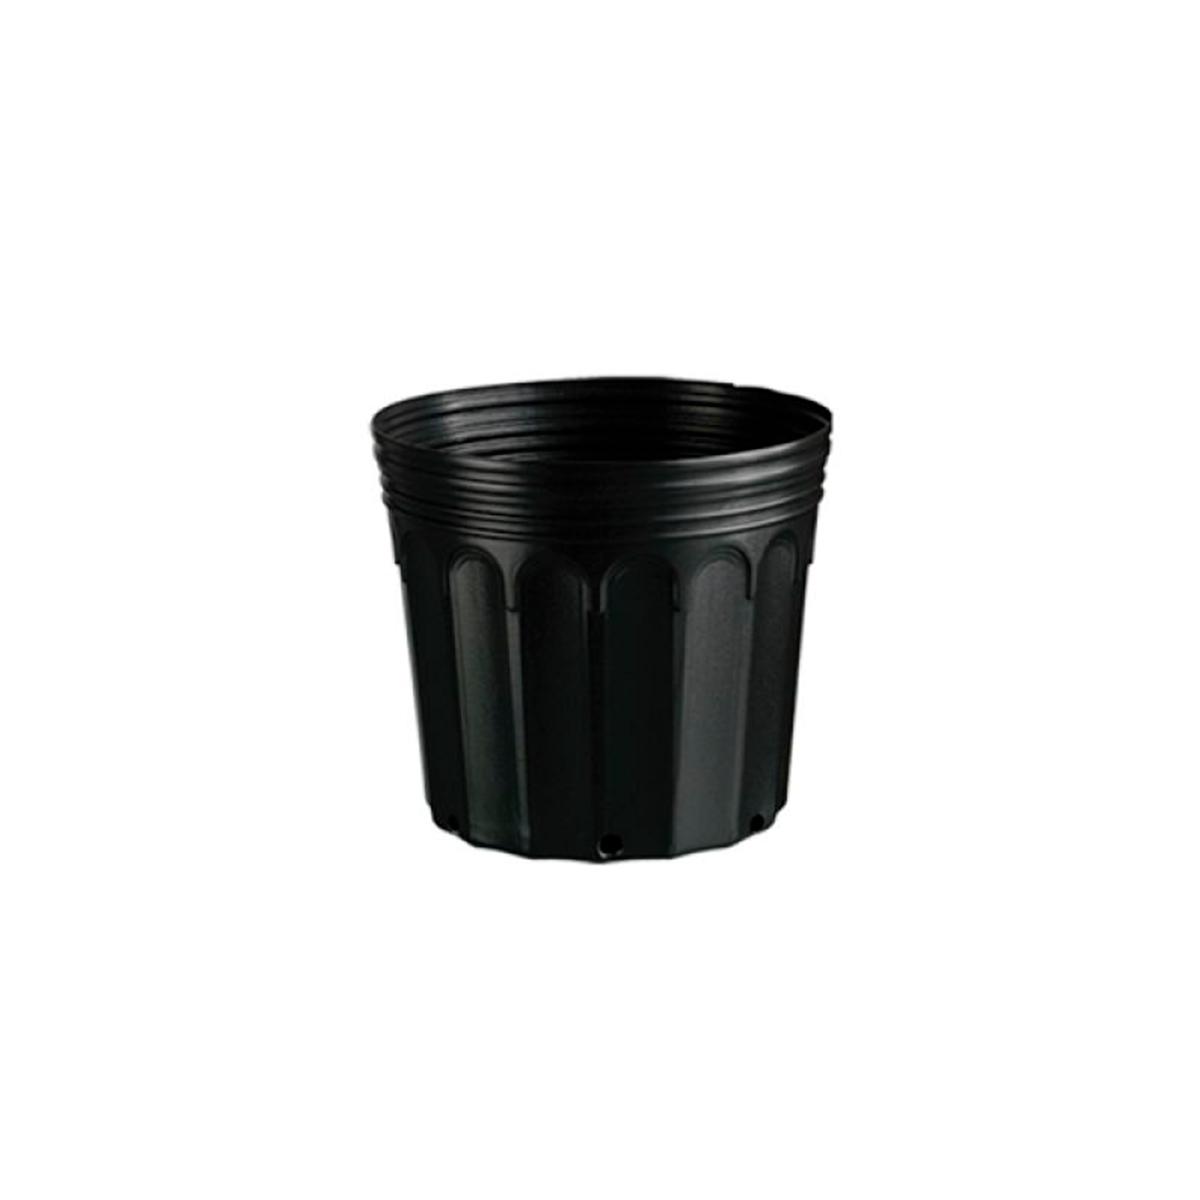 Kit 40 Embalagem Vaso para Mudas Plástico 3,6L